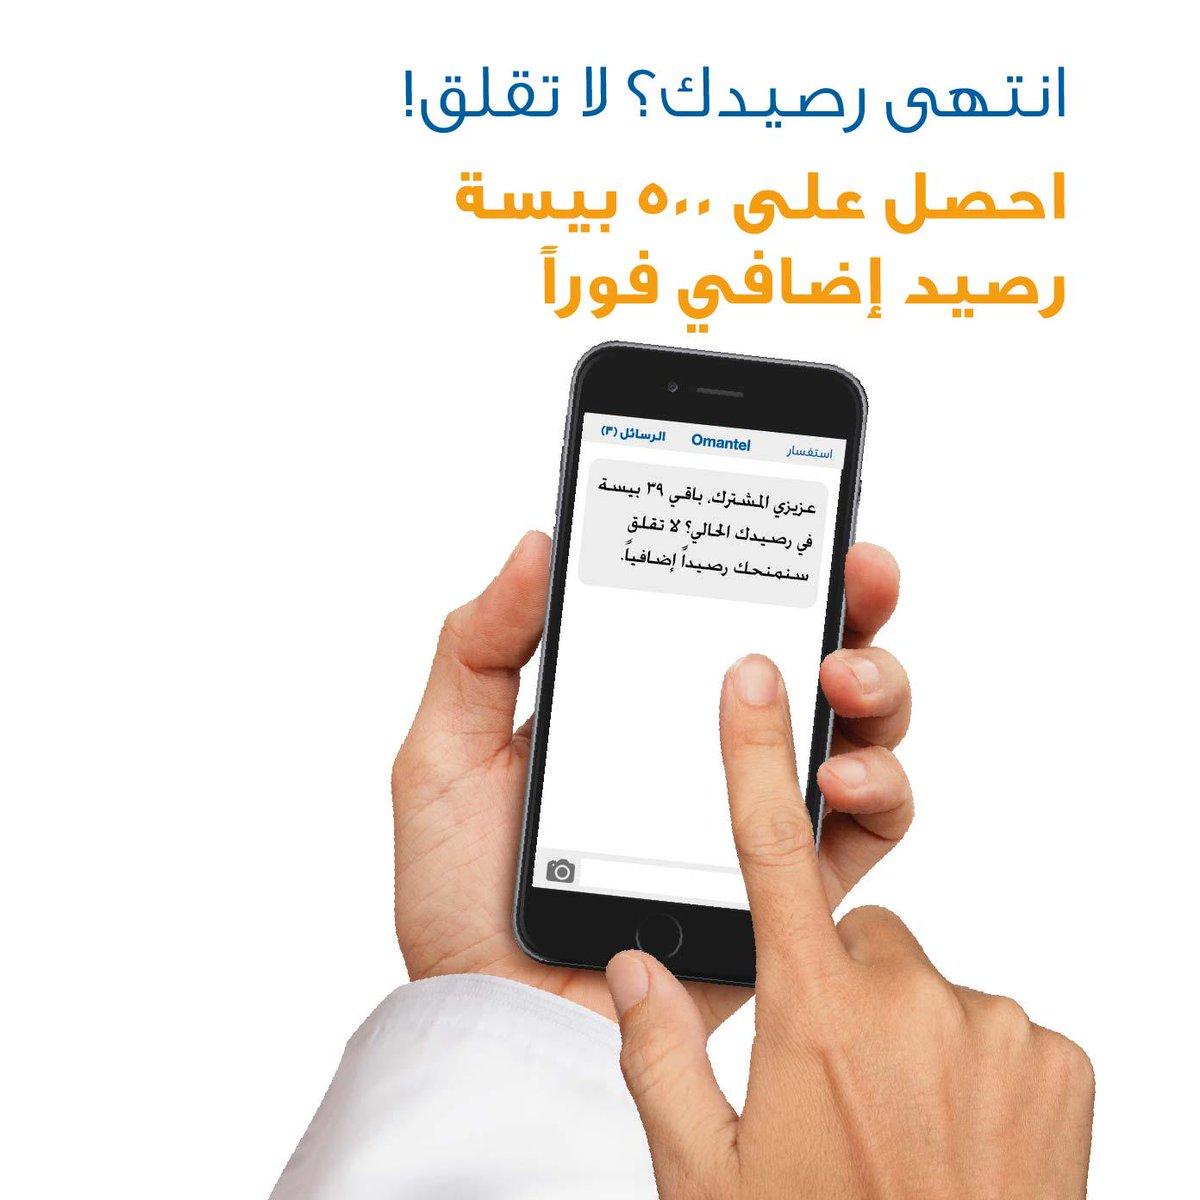 Omantel عمانتل On Twitter خدمة رصيد الطوارئ ستمكنك من